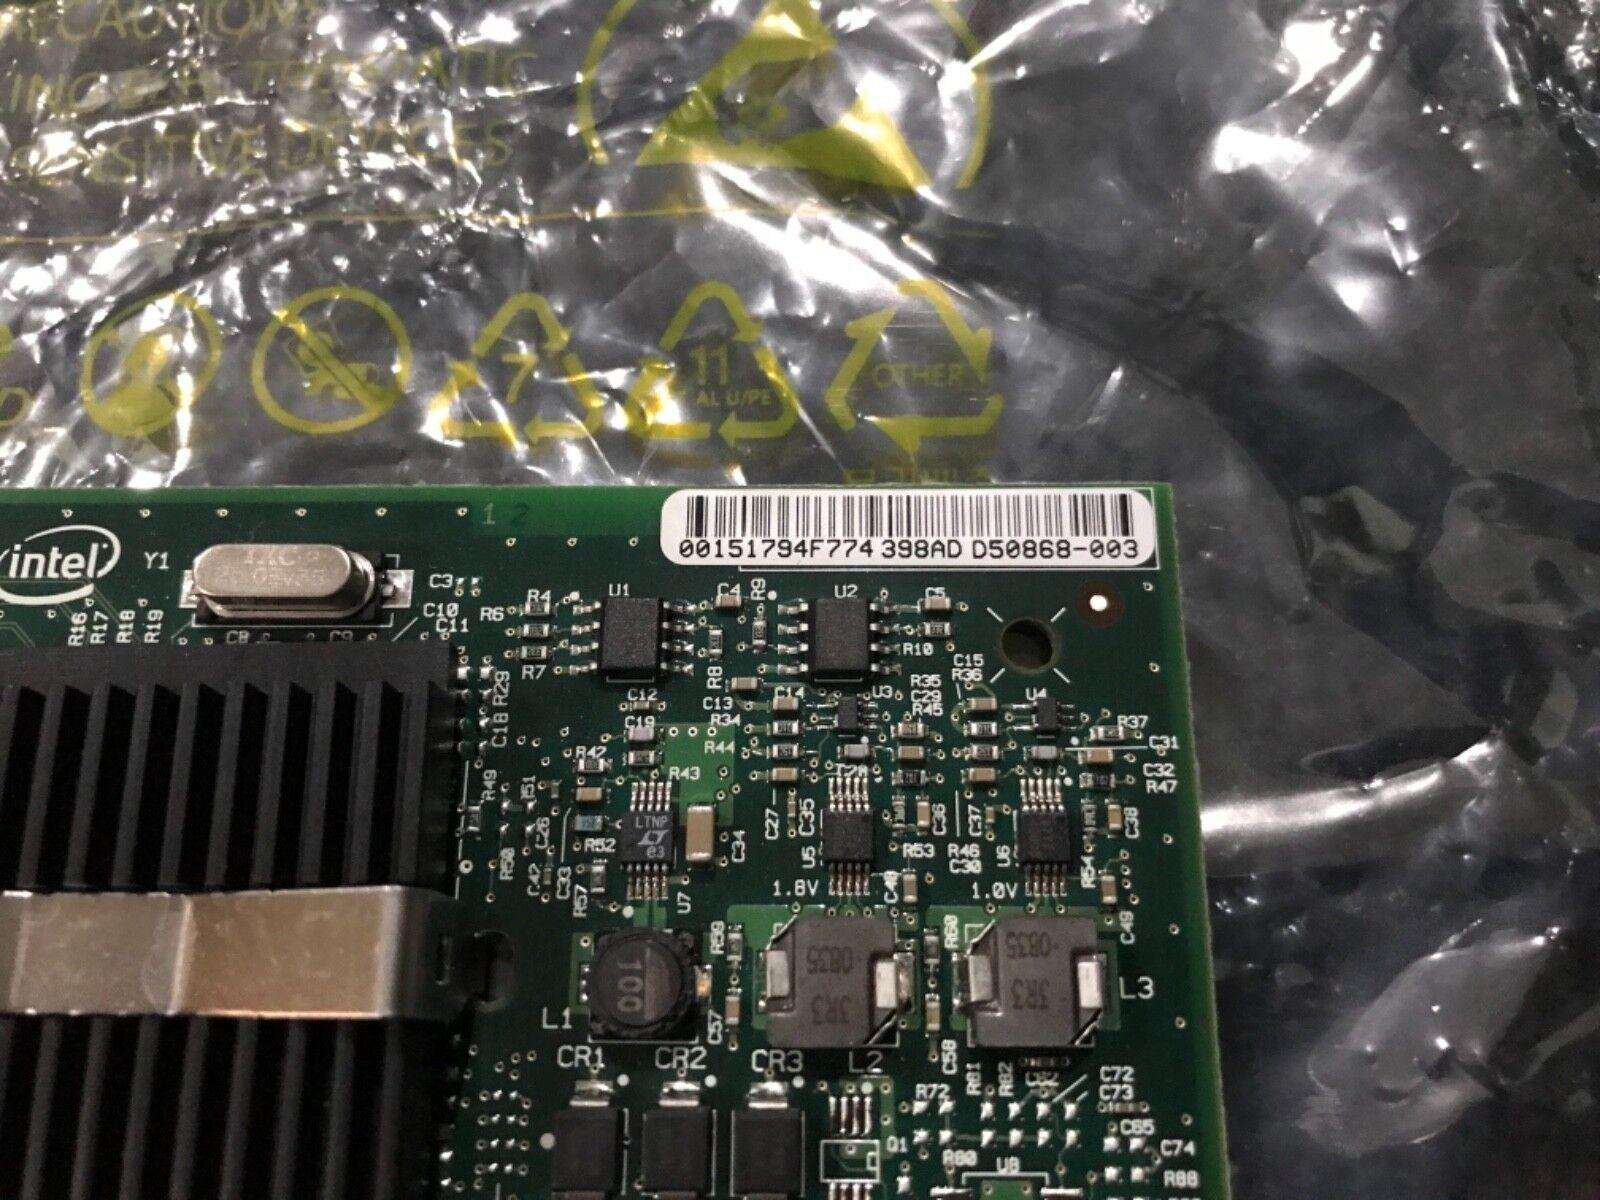 (2) Intel PRO/1000 High Profile Dual Port PCI-E Ethernet Network Card D49919-002